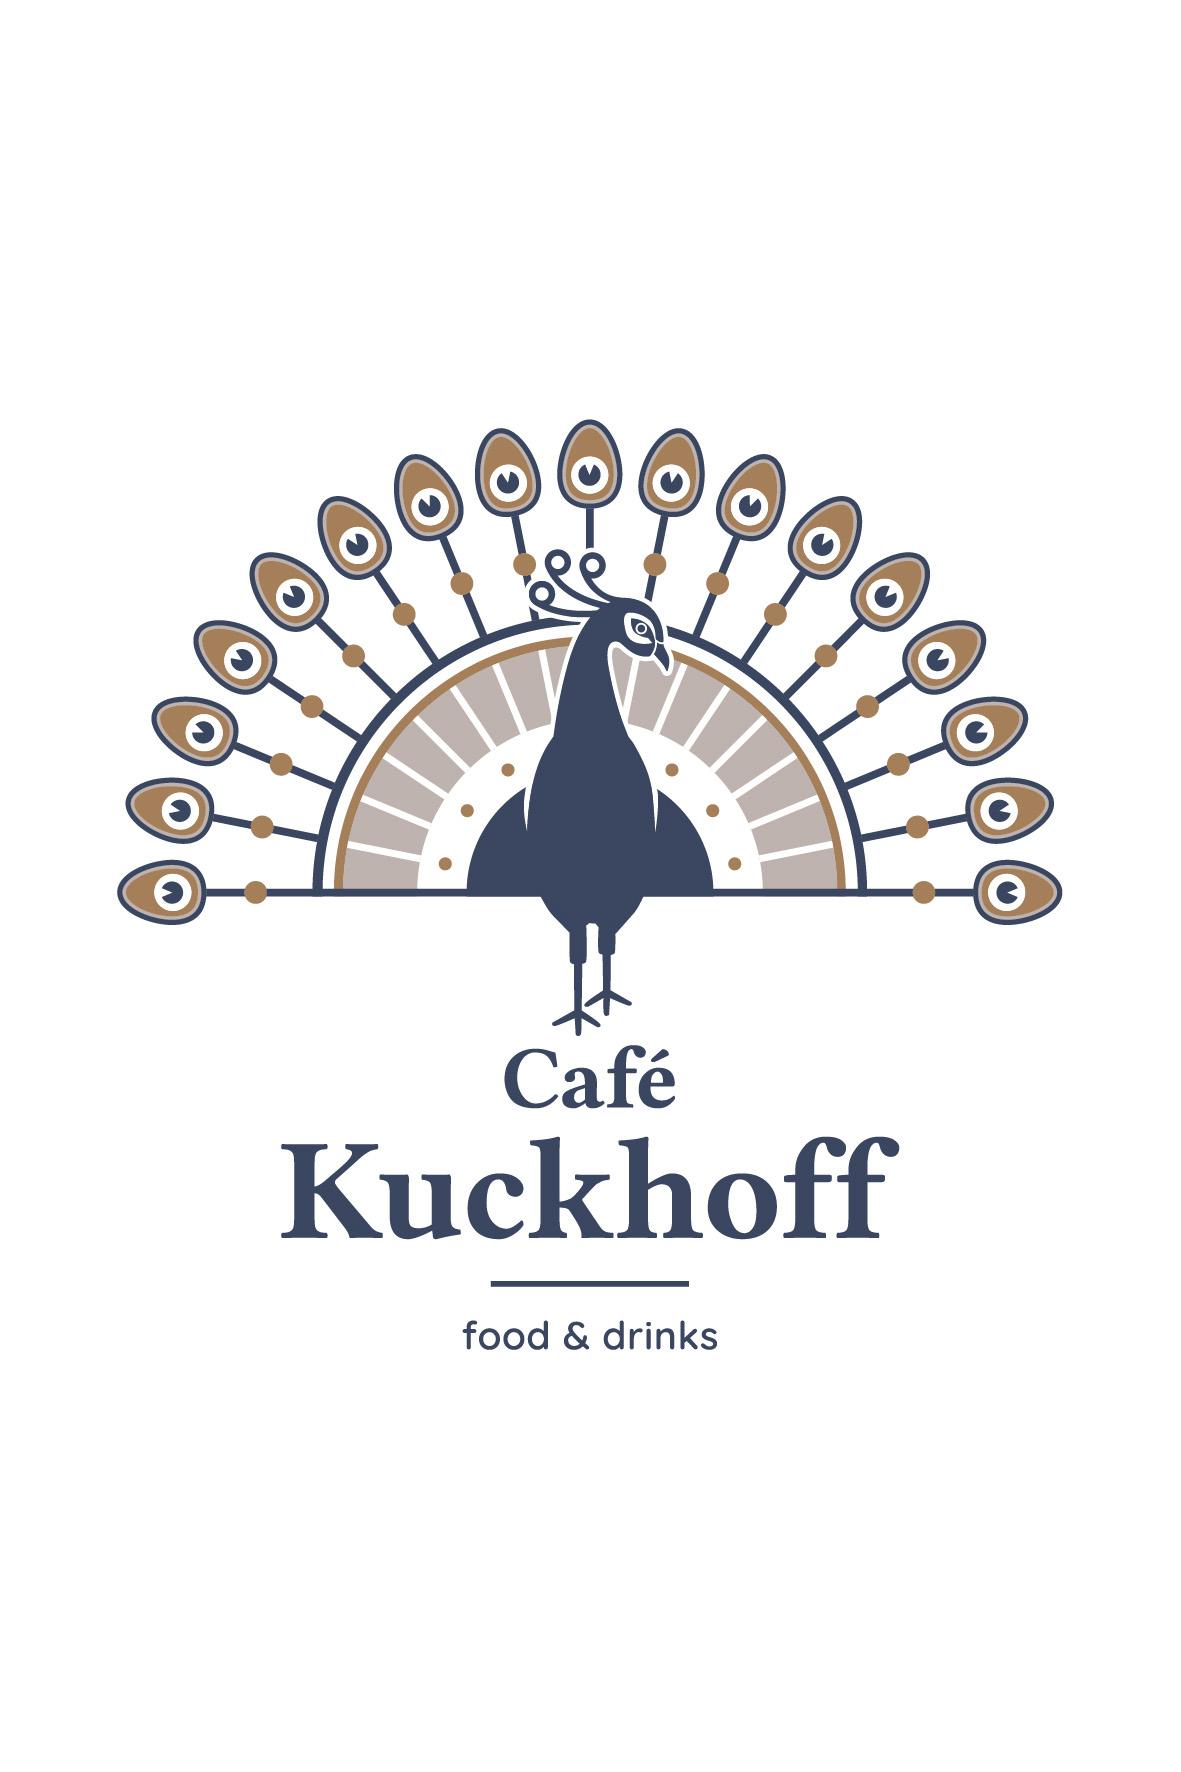 Café Kuckhoff